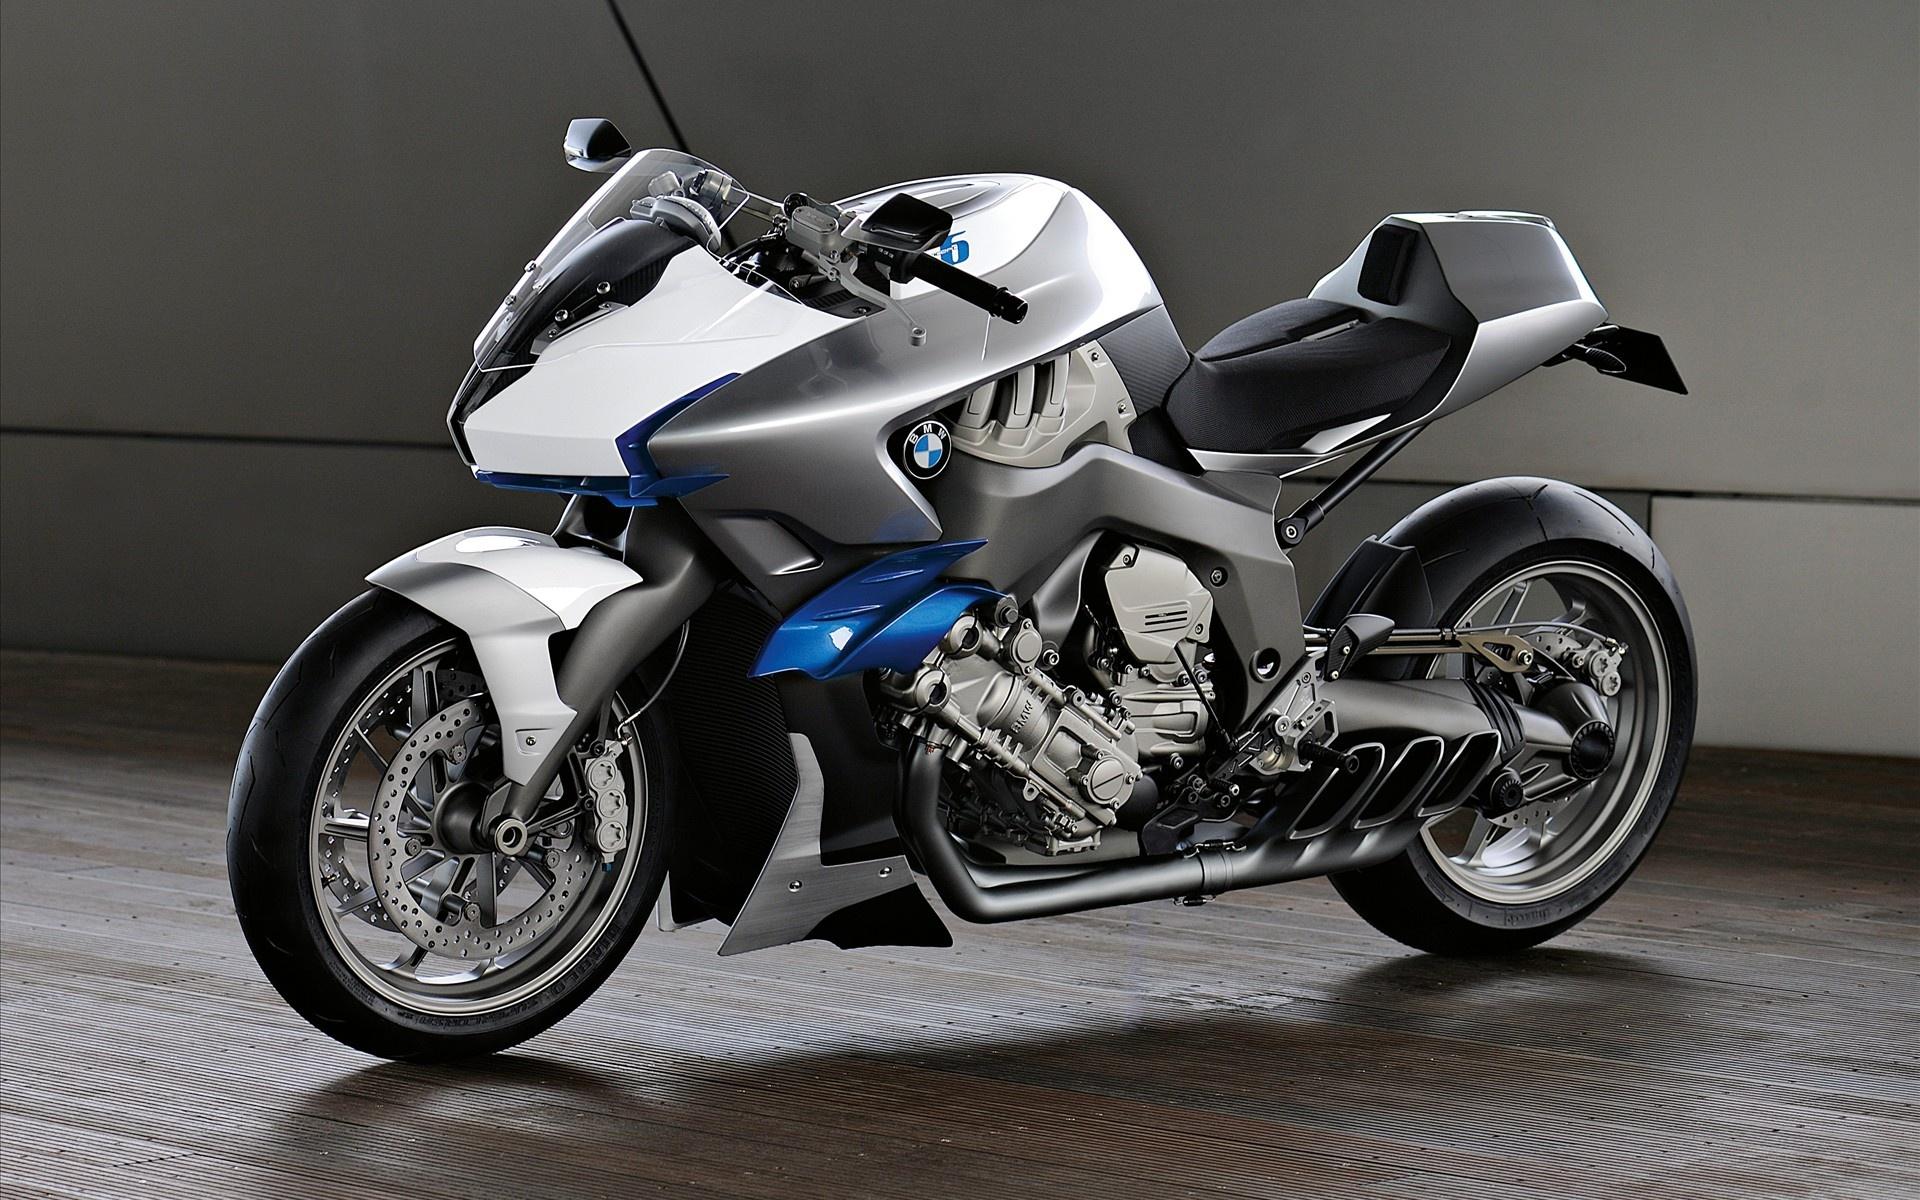 http://4.bp.blogspot.com/-QJBczrUN5Uo/UNB_m65OXQI/AAAAAAAALC8/veSlVJphWOs/s1920/bmw-motorrad-concept-2-bike-1200.jpg